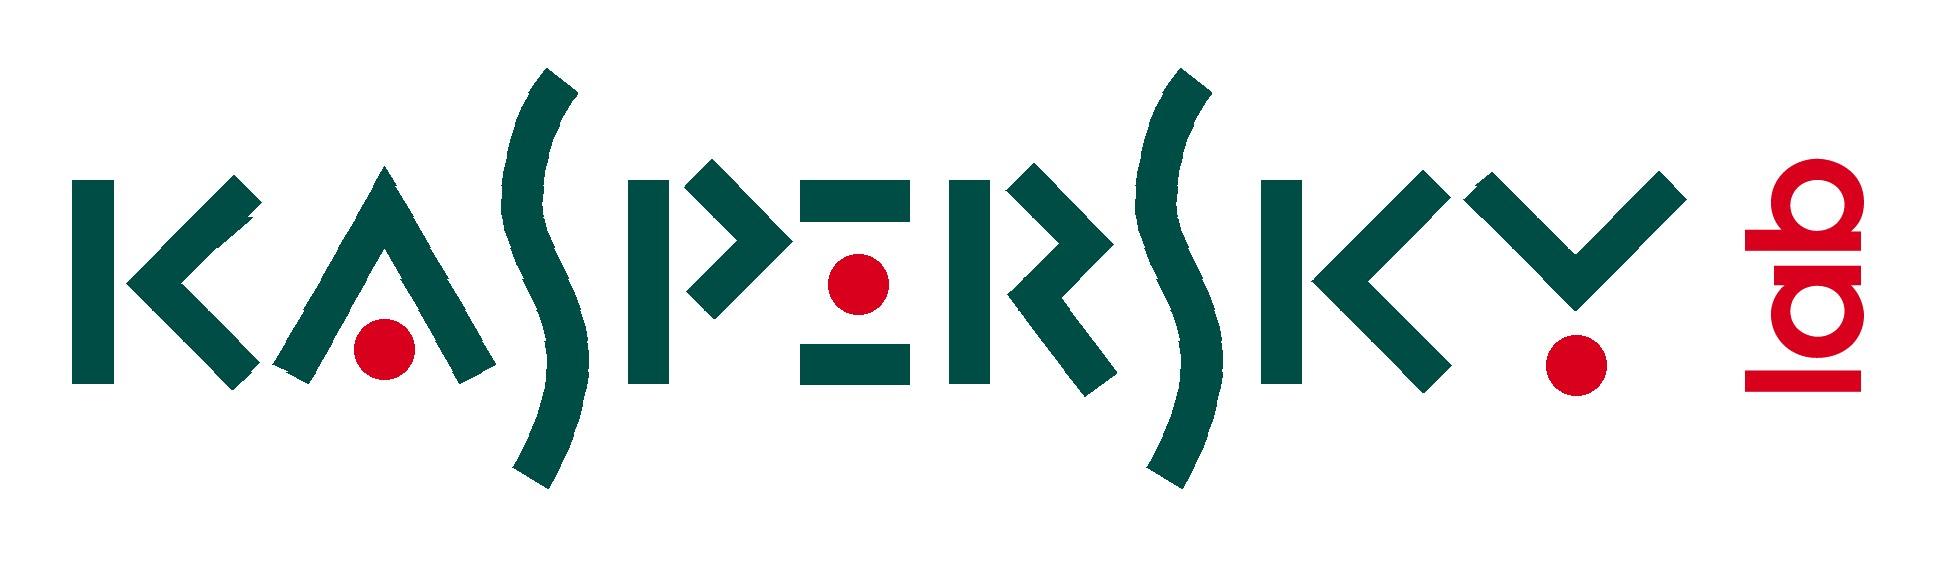 معرفی شرکت KasperSky